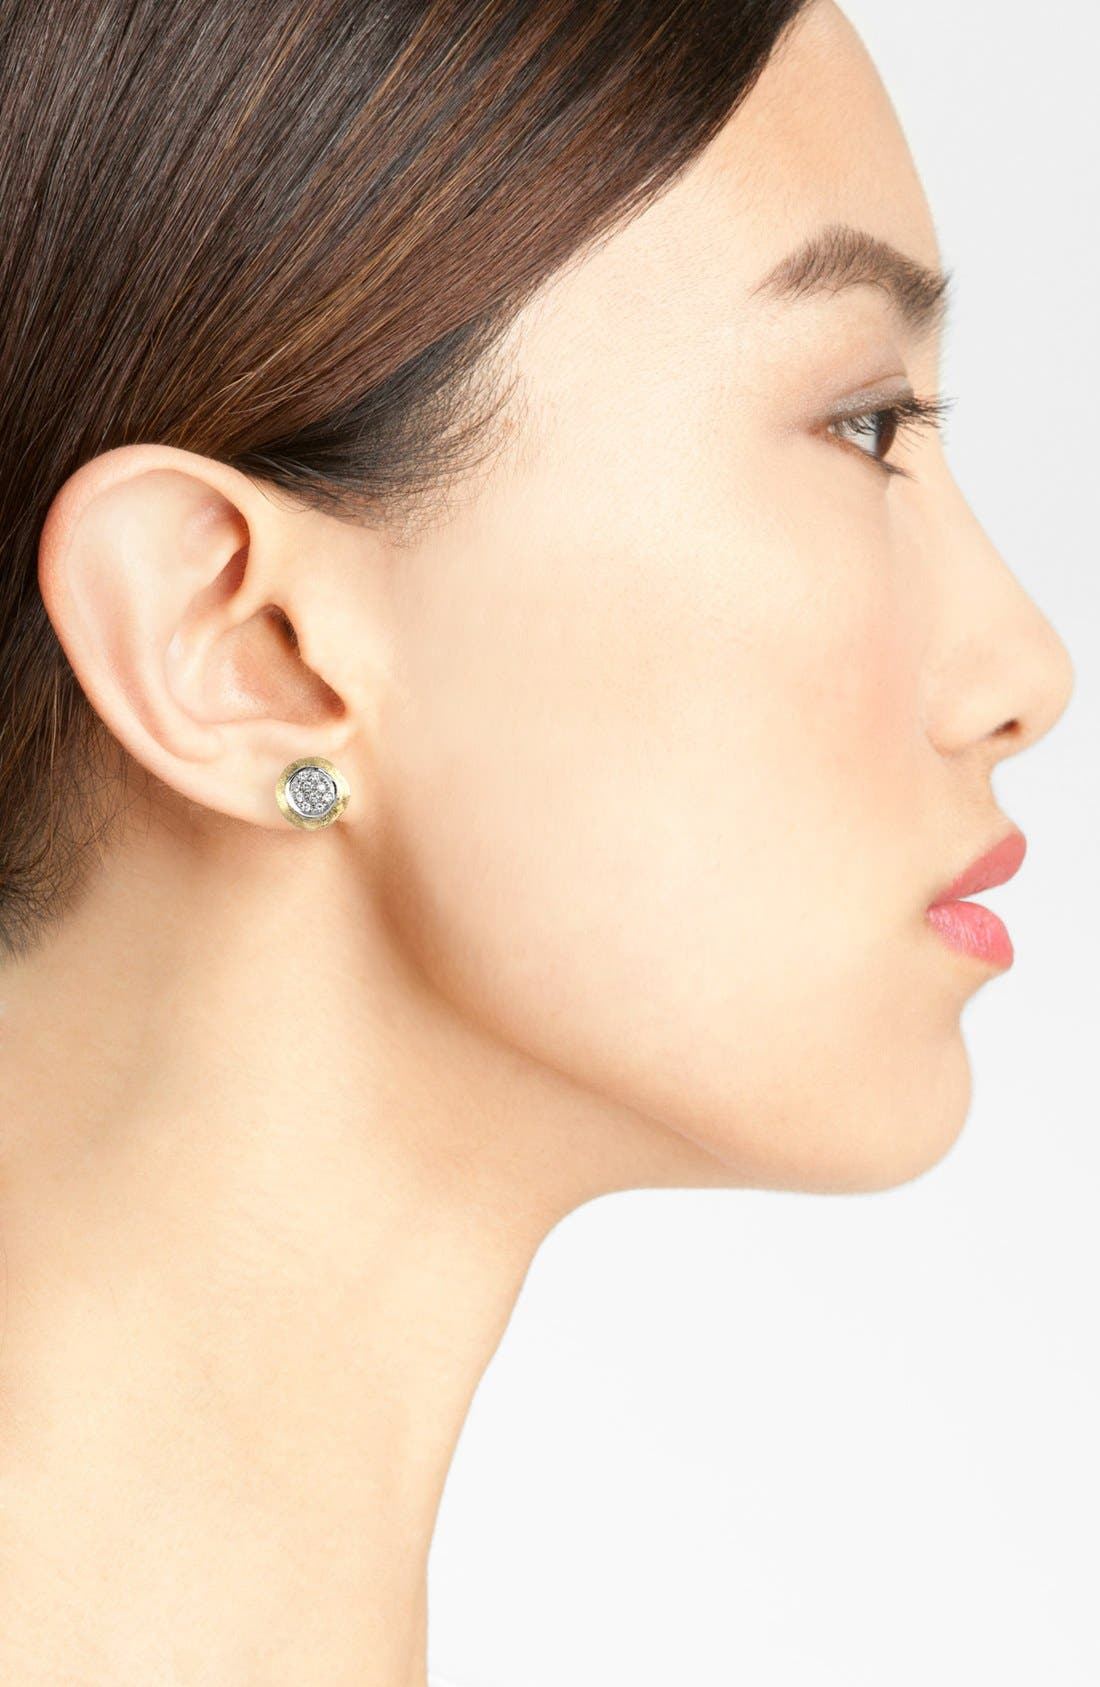 'Delicate' Diamond Stud Earrings,                             Alternate thumbnail 2, color,                             YELLOW GOLD